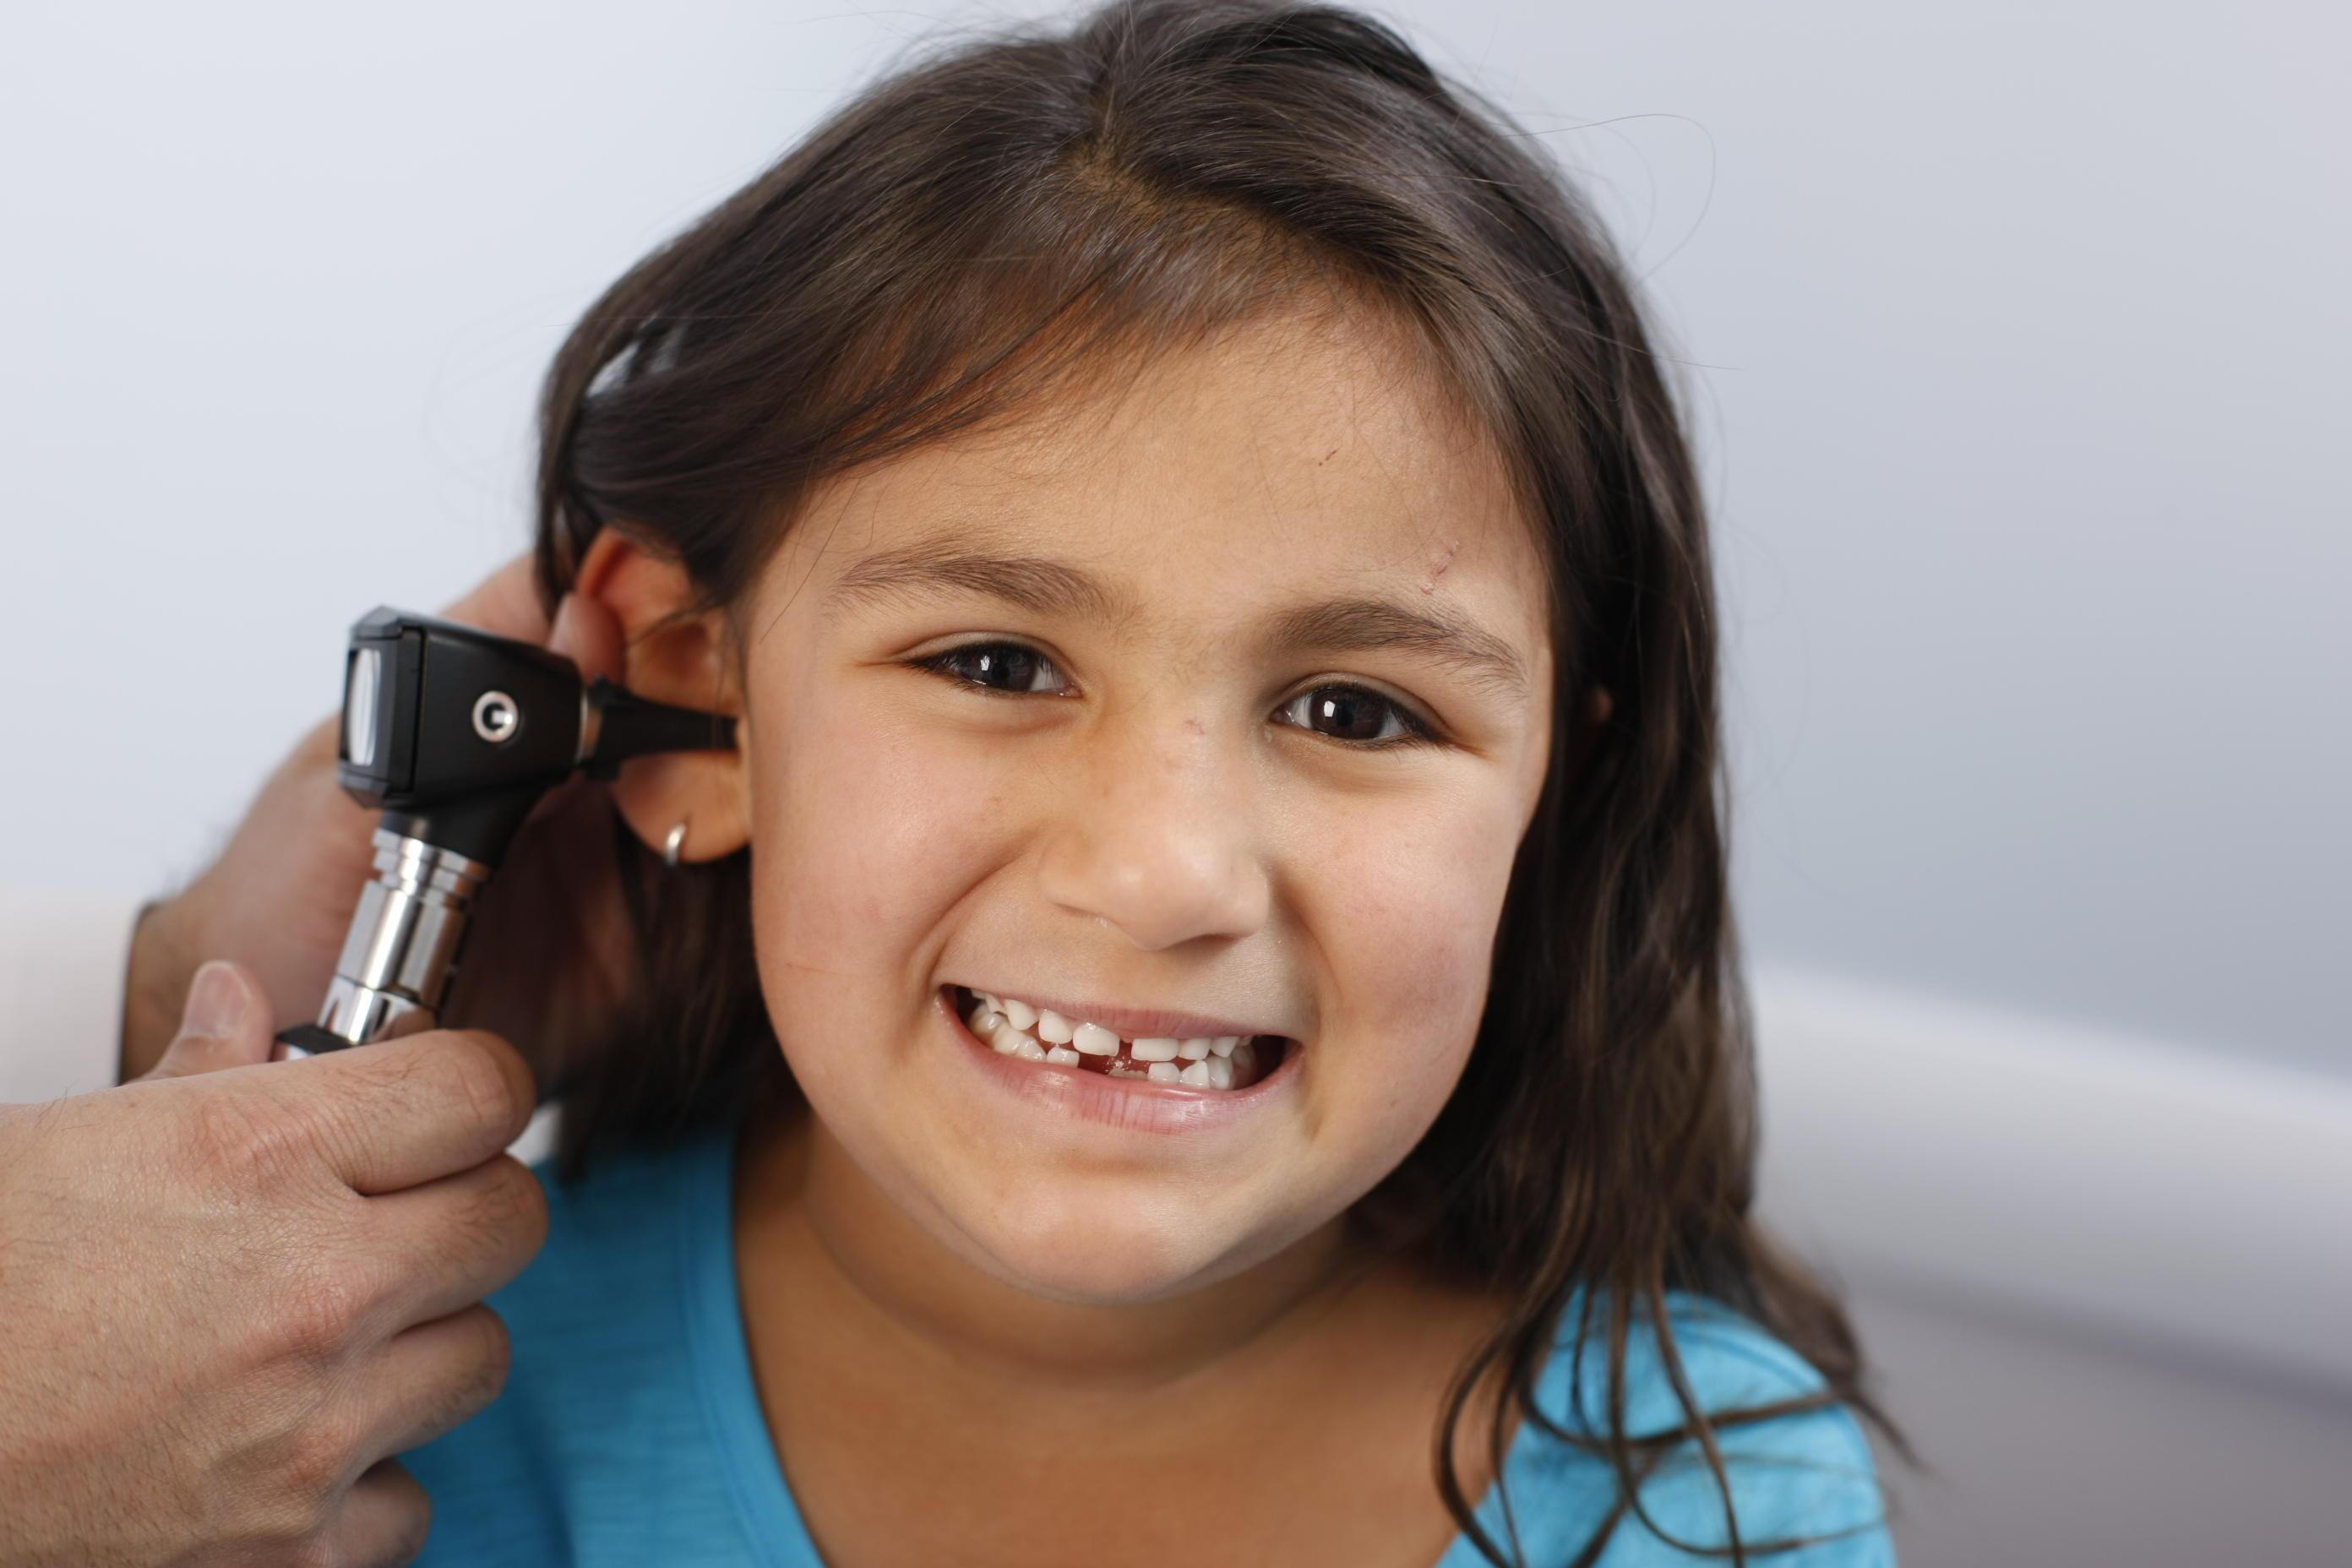 Cook Children's Urgent Care and Pediatric Specialties - Mansfield image 0